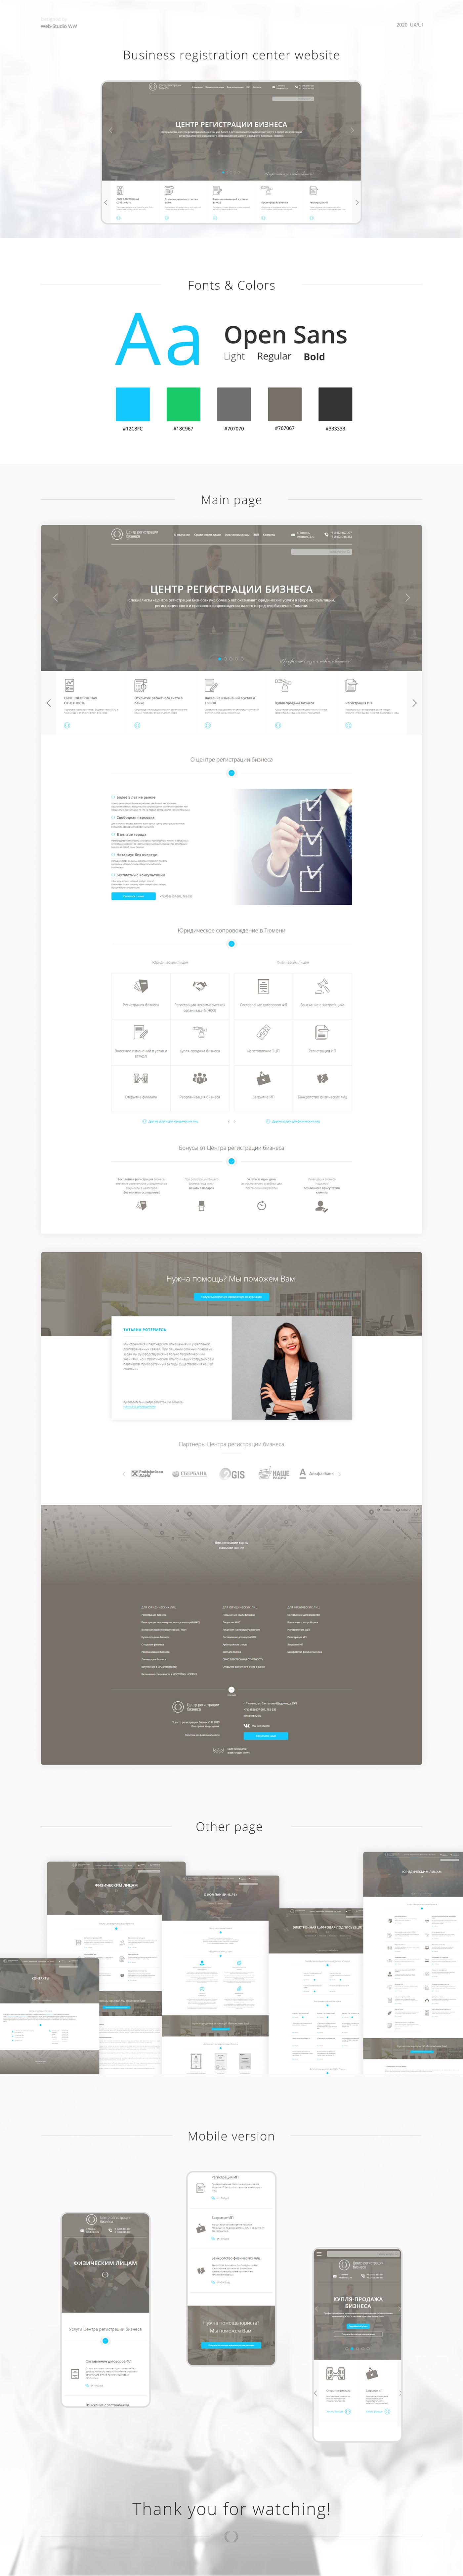 business law site Web